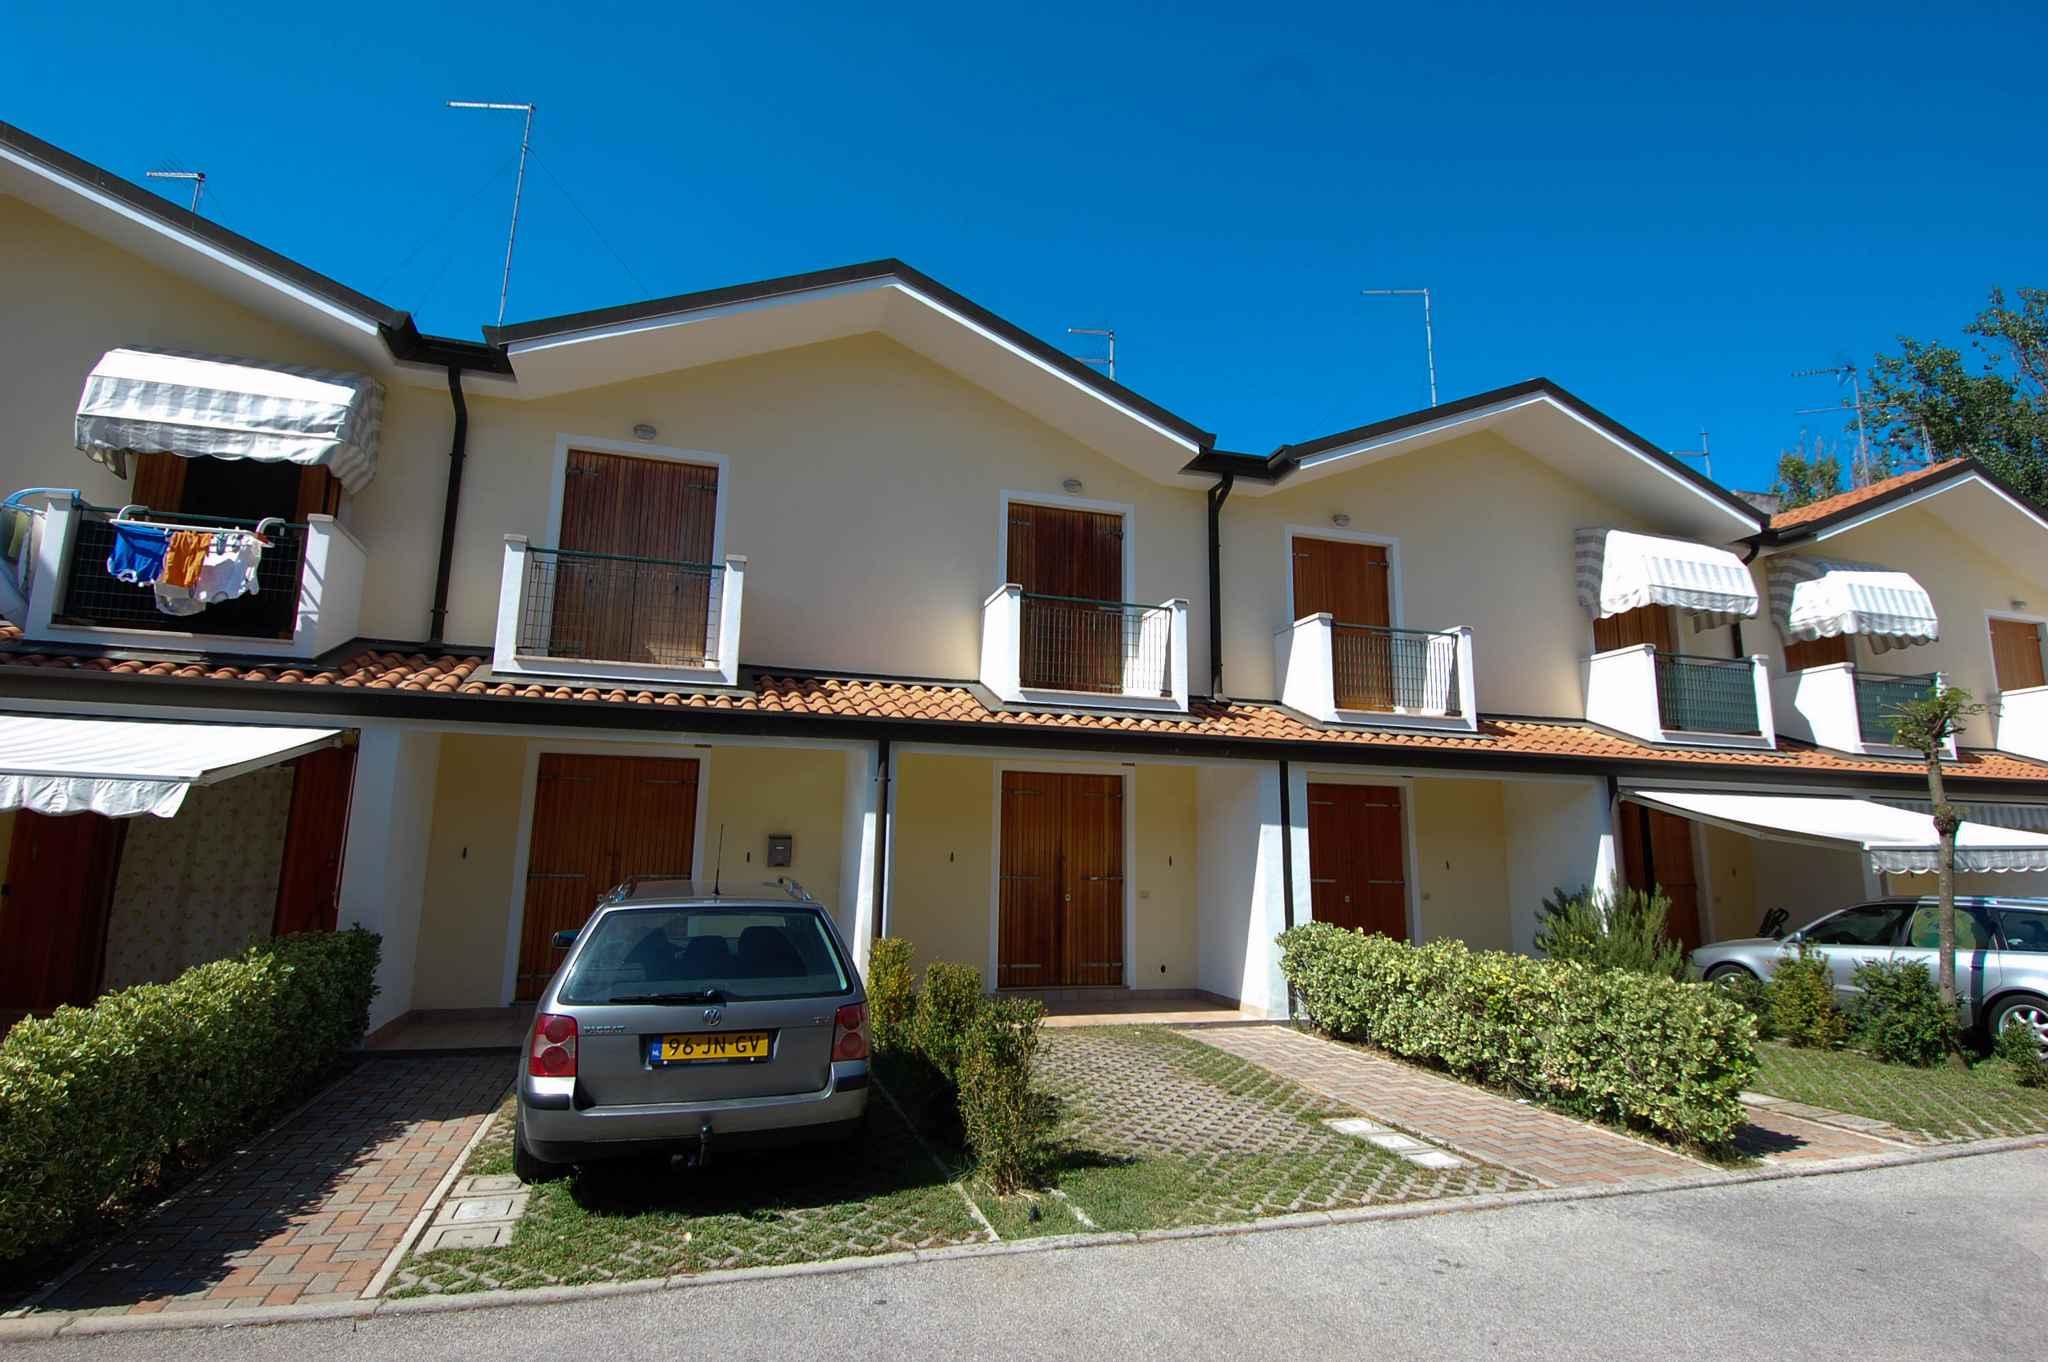 Ferienhaus mit Pool und Grill (284304), Rosolina Mare, Rovigo, Venetien, Italien, Bild 2